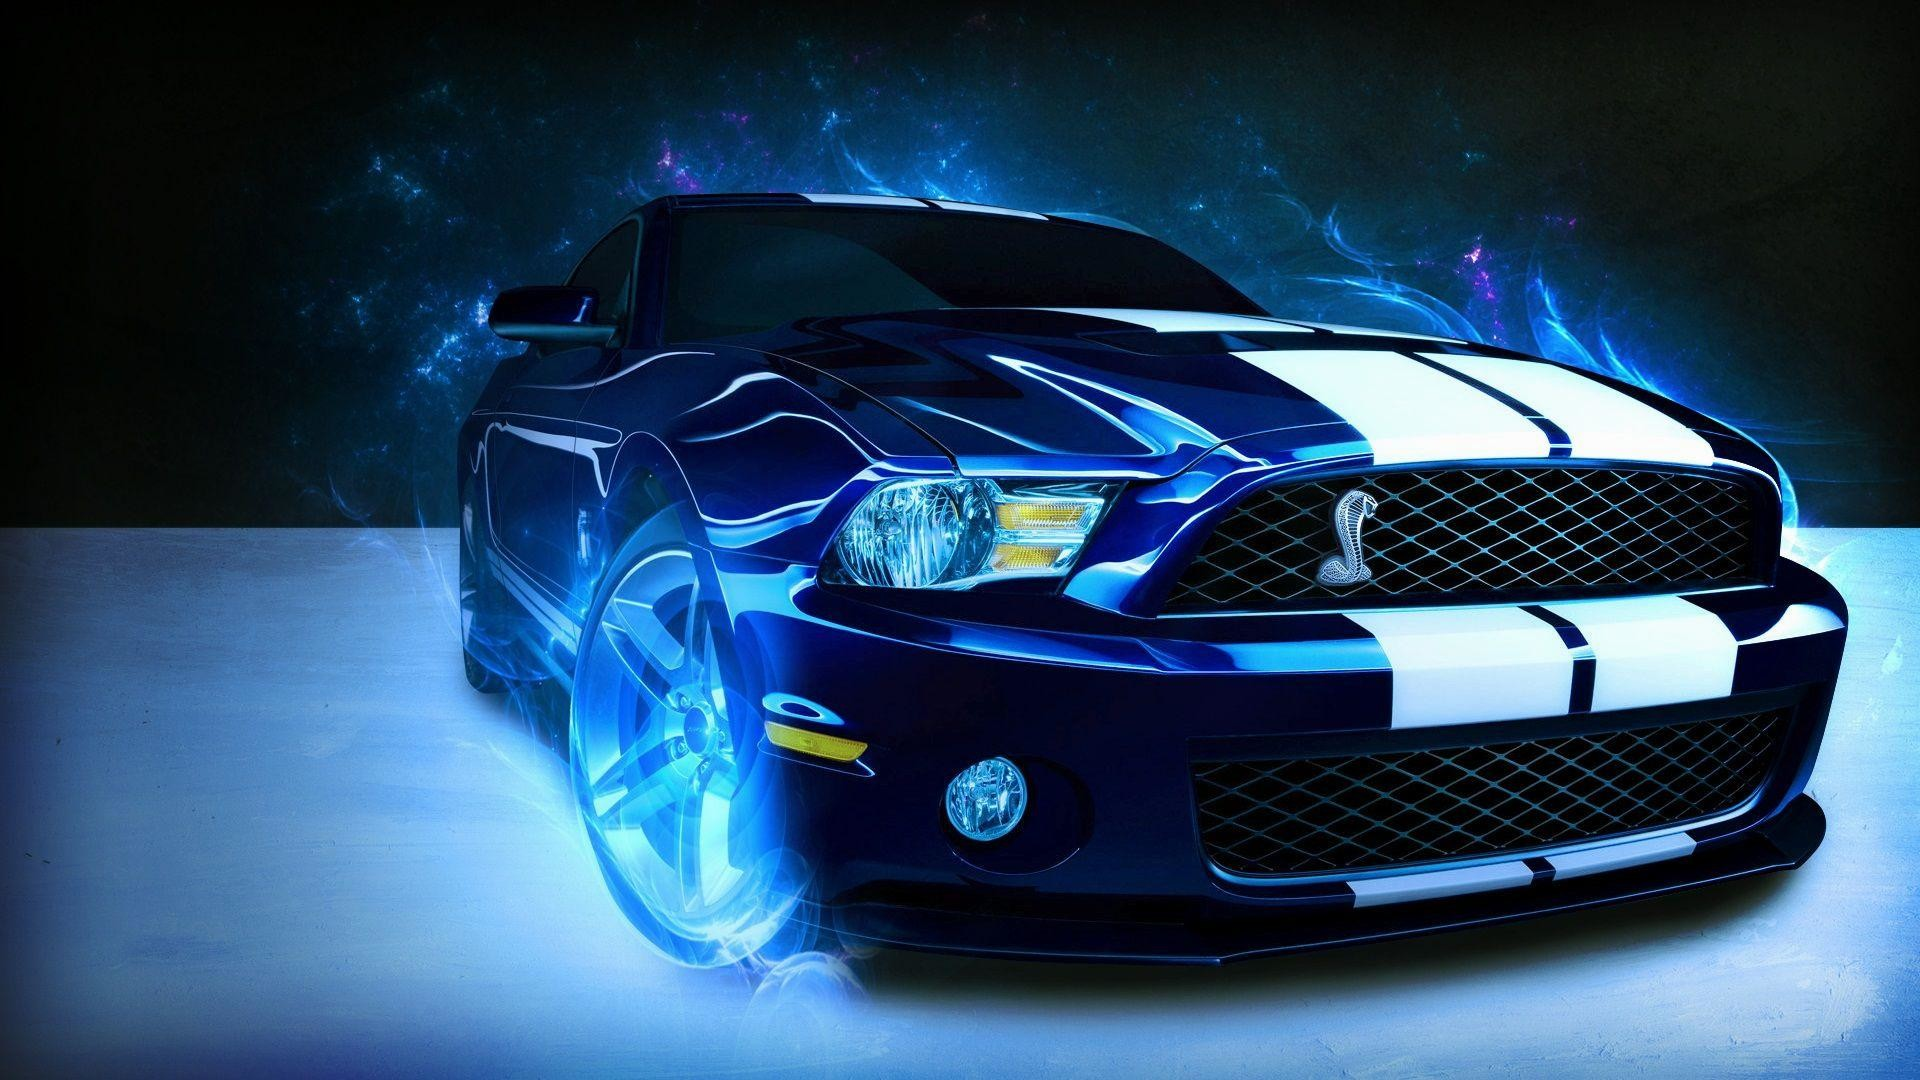 HD-Ford-Wallpaper-For-Desktop